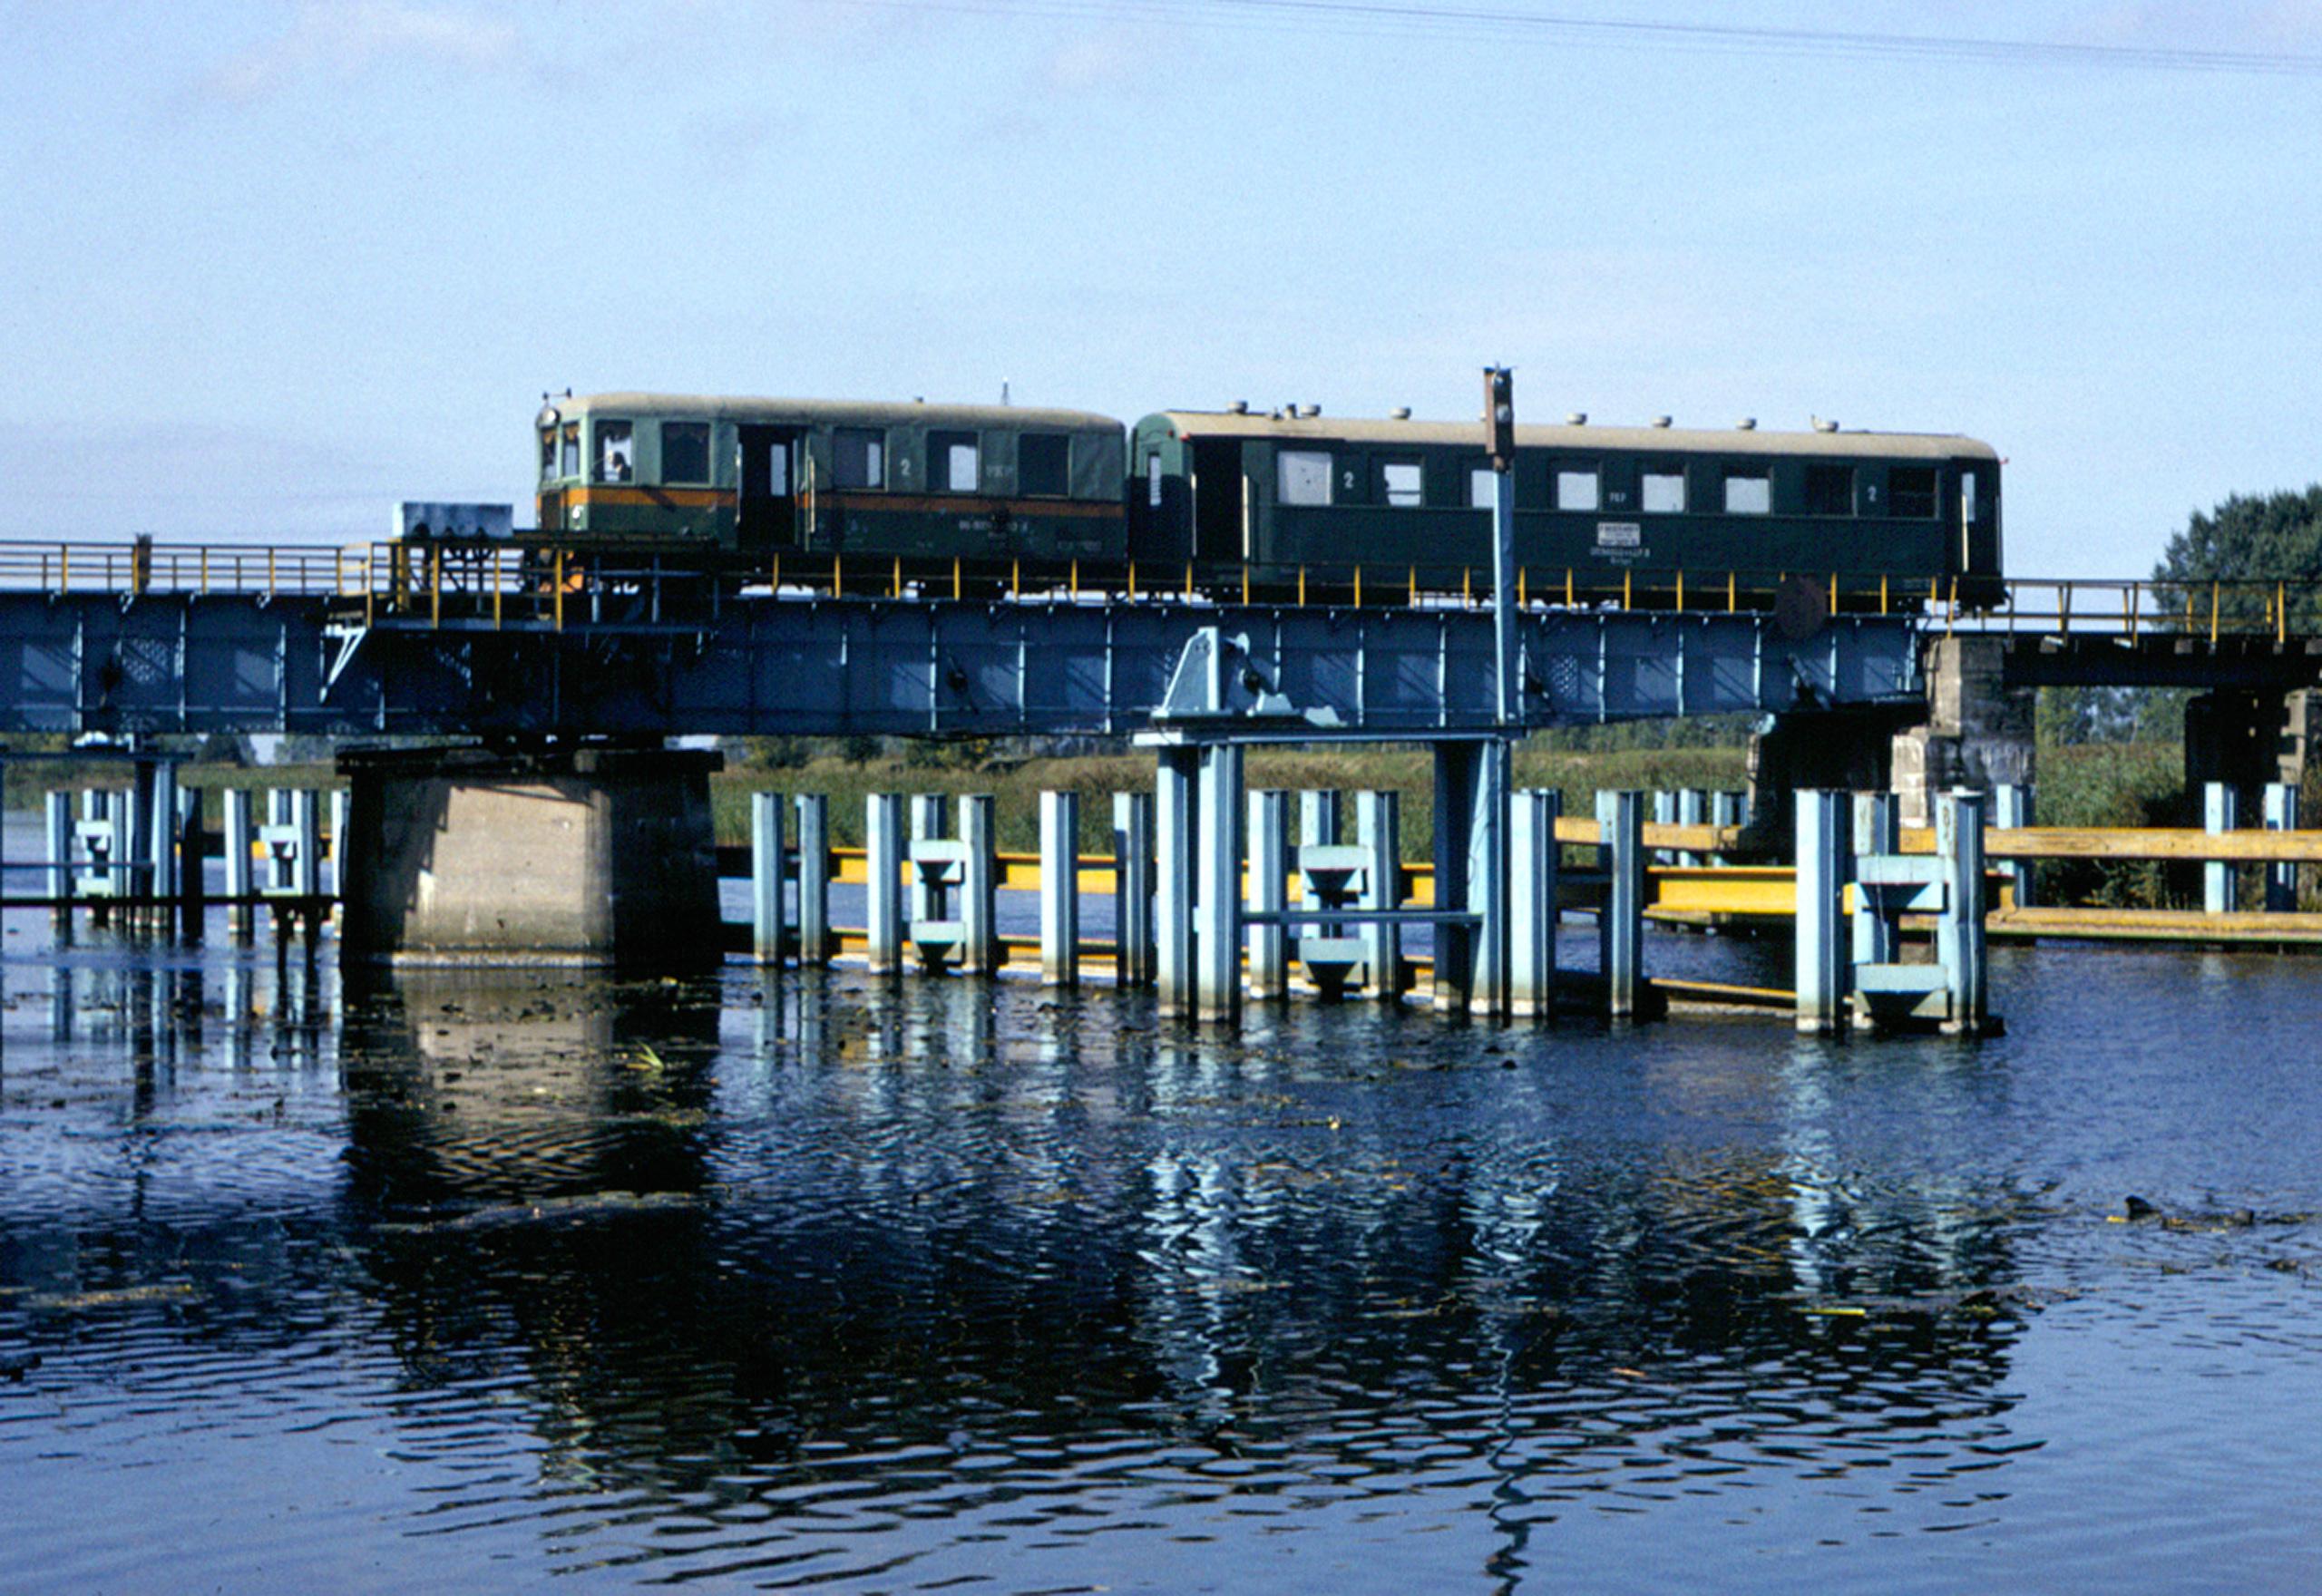 Crossing the Szkarpawa River on a swing bridge at Rybina